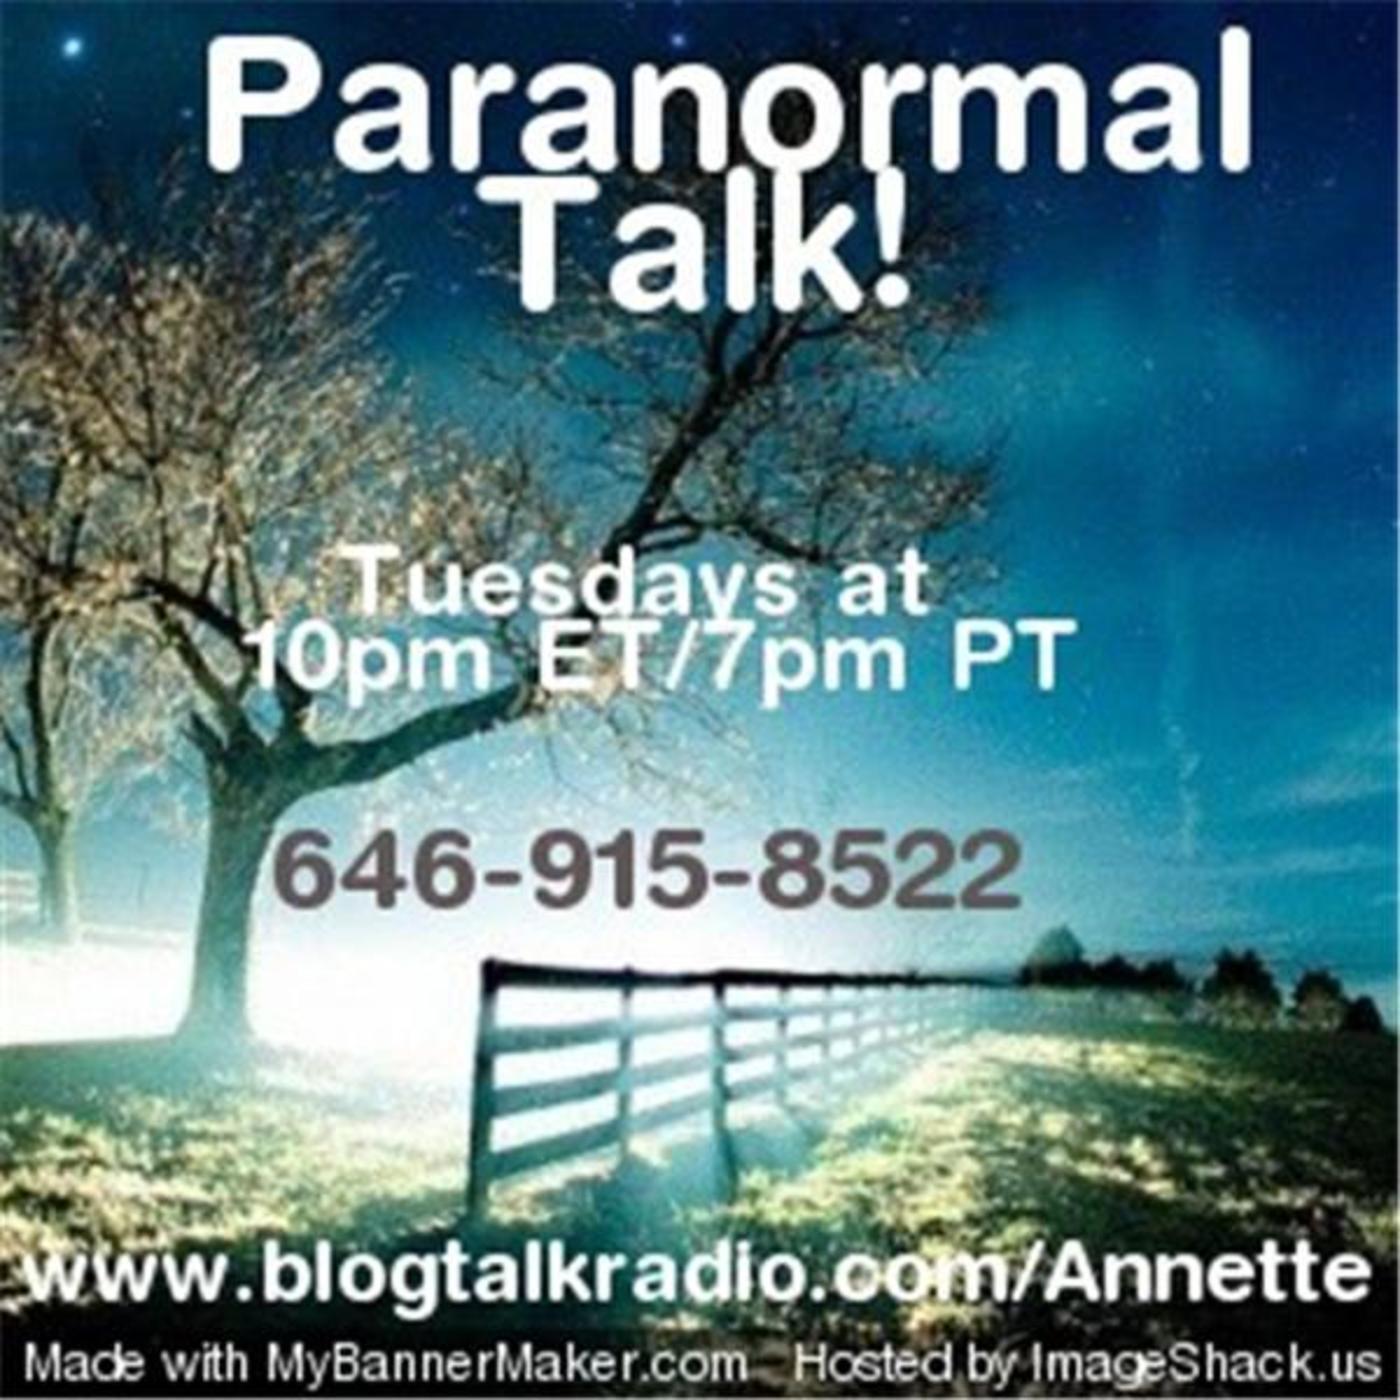 Paranormal Talk!™